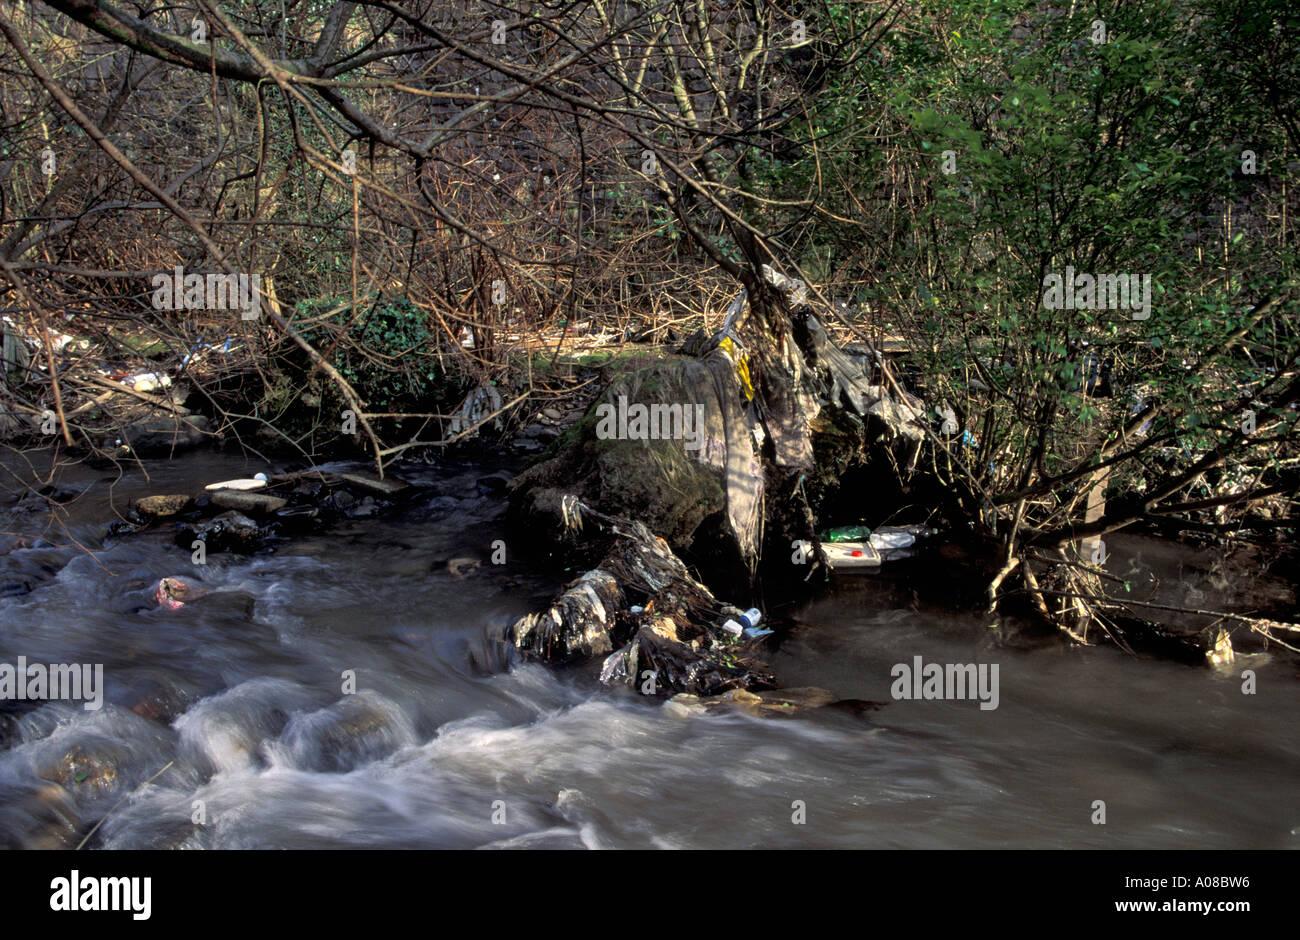 Plastic debris trapped in riverside branches, Afon Llynfi, Caerau, Wales - Stock Image